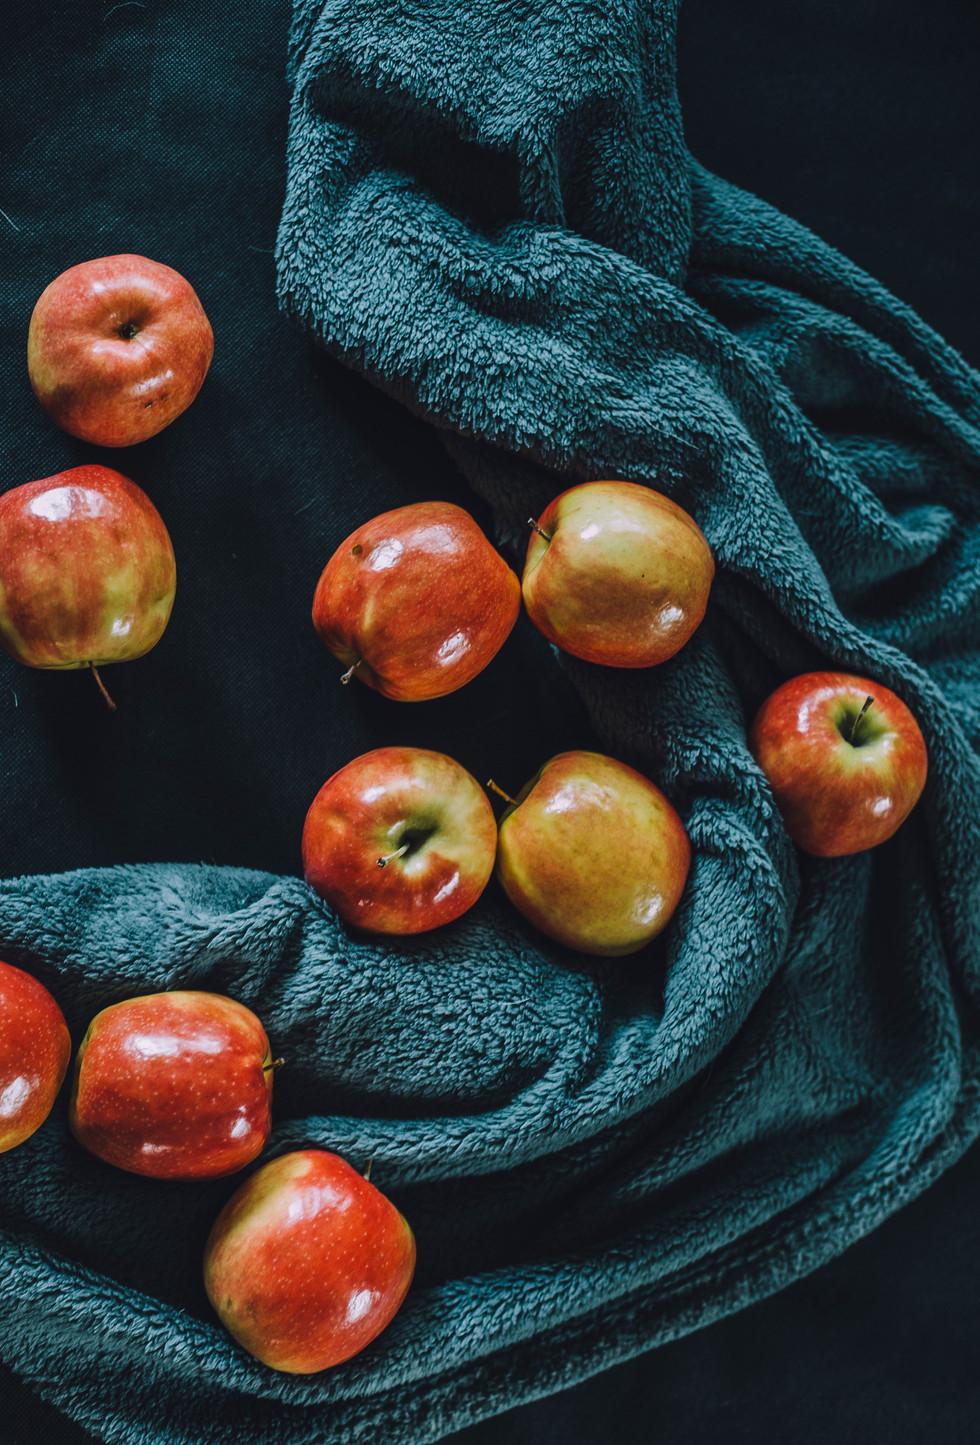 Still life food photo of apples